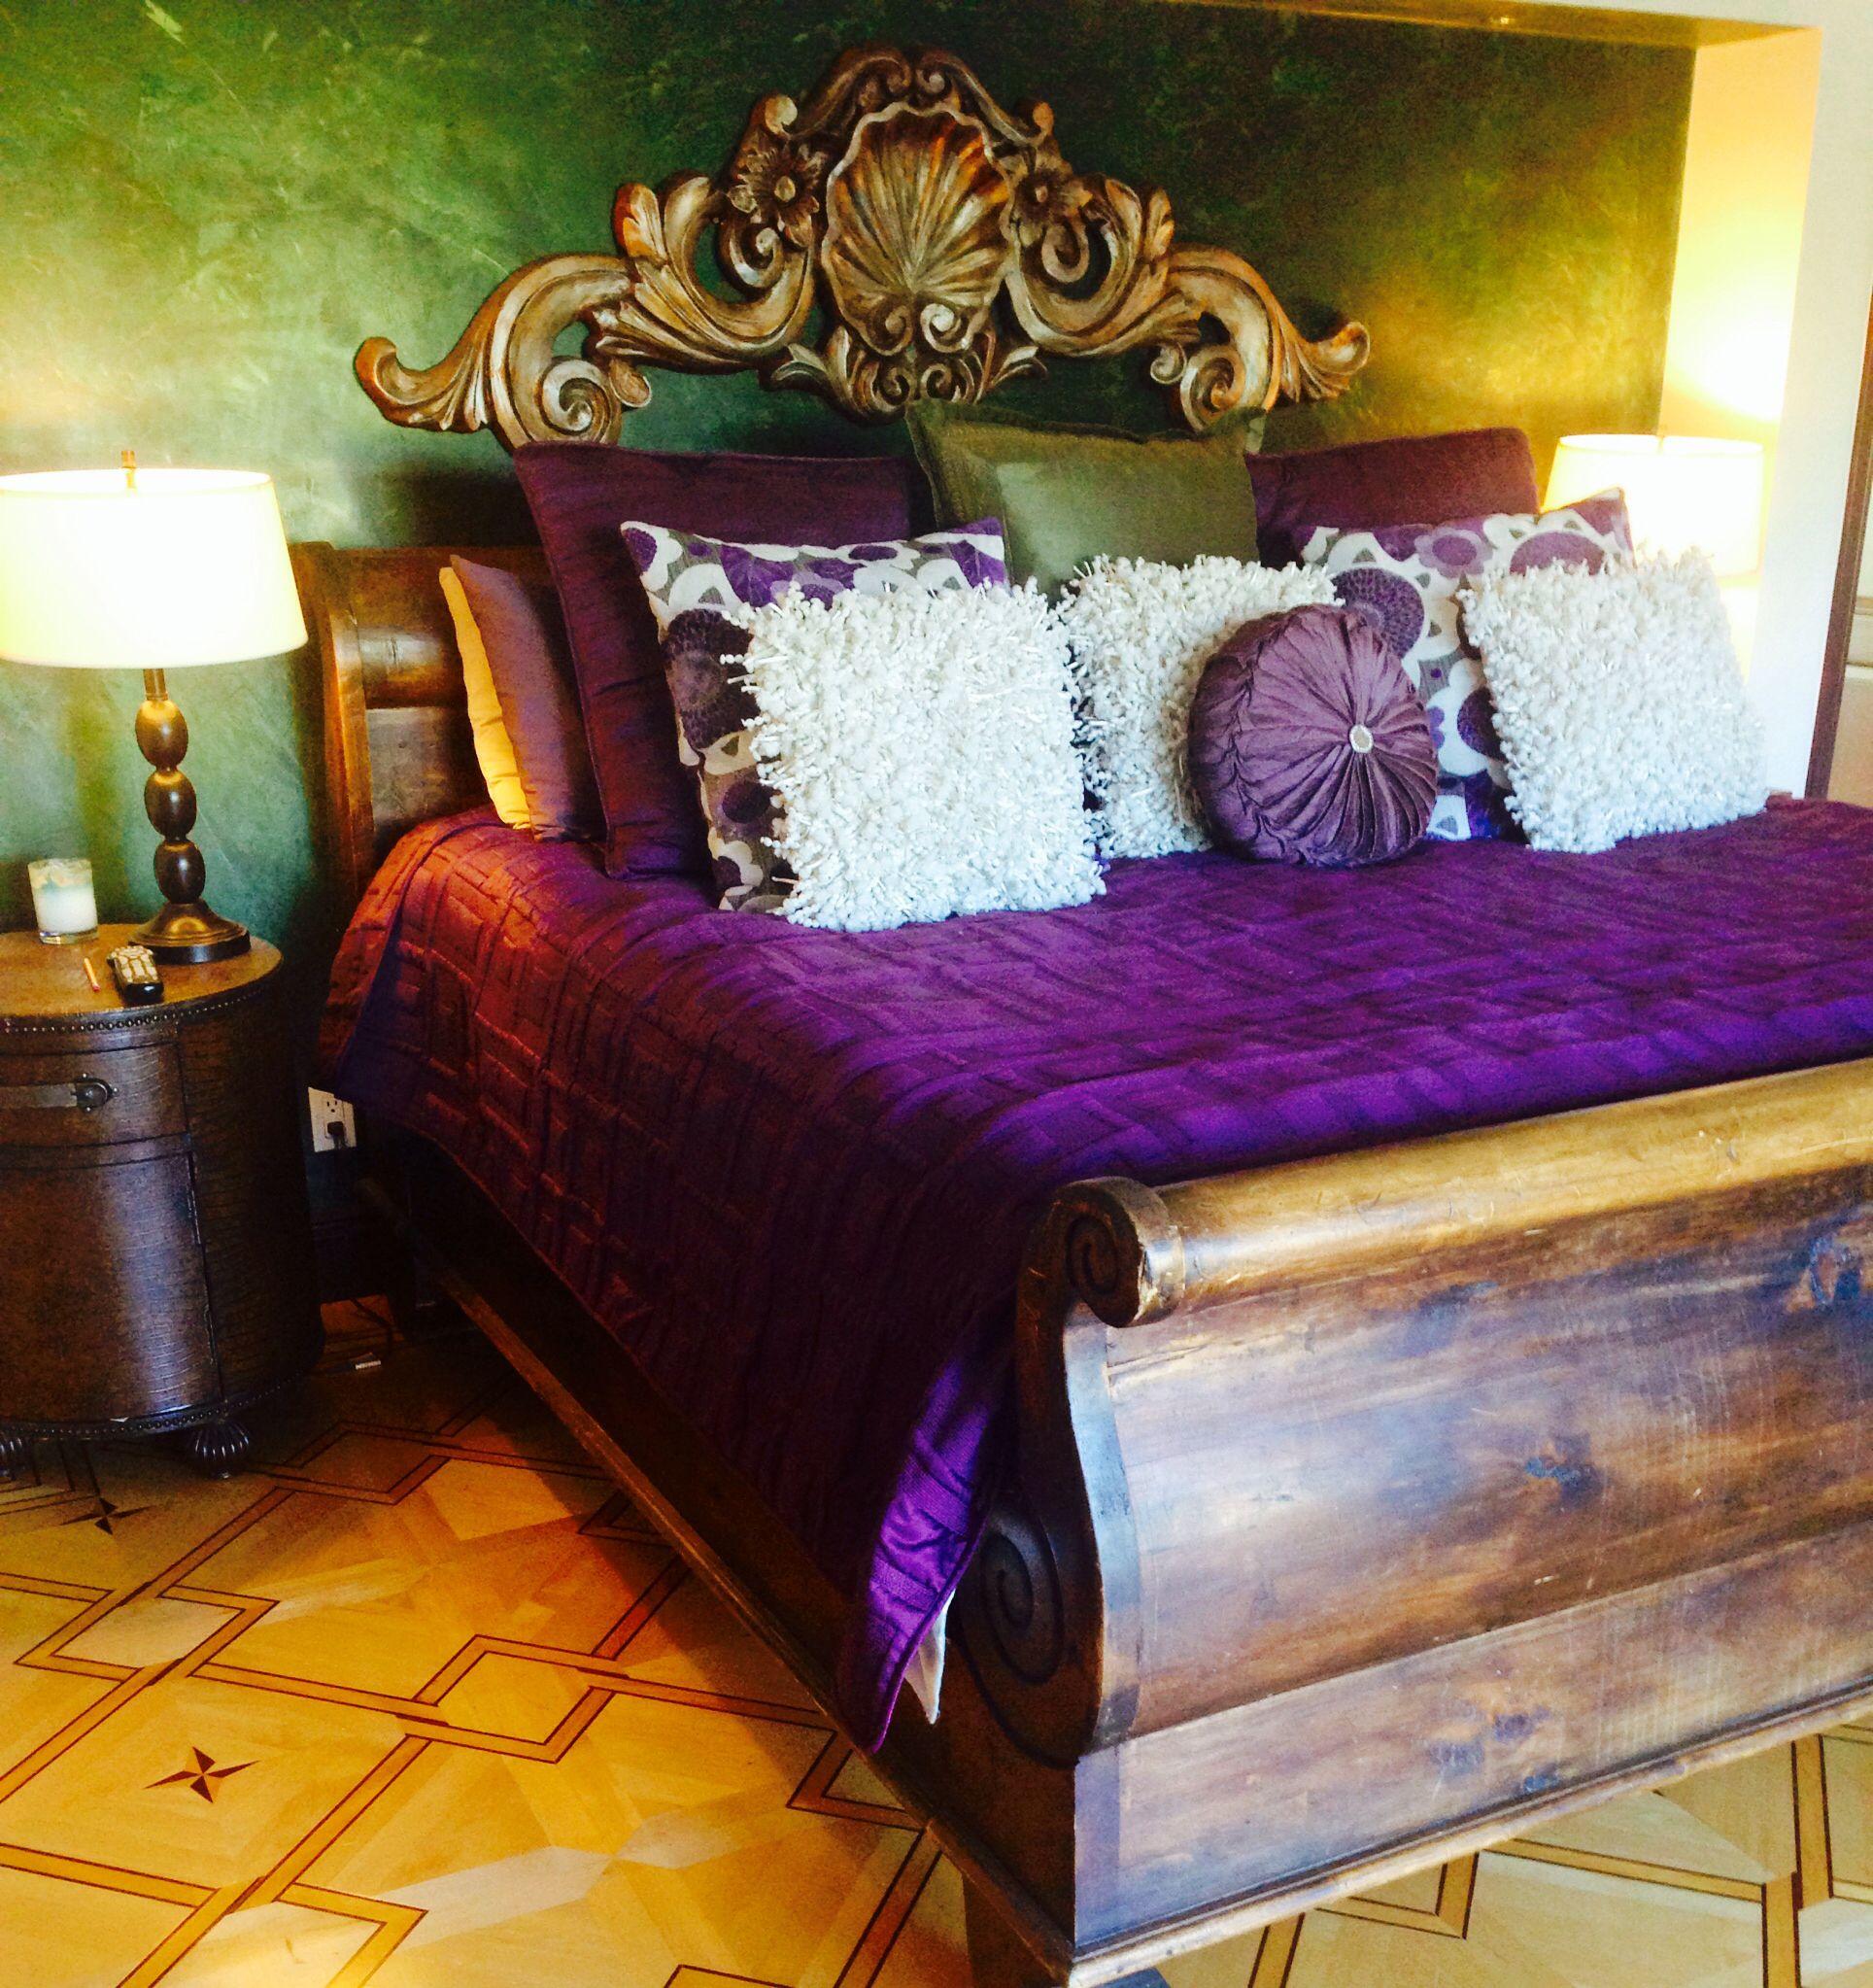 purple and green room so royal bedroom dreams pinterest. Black Bedroom Furniture Sets. Home Design Ideas